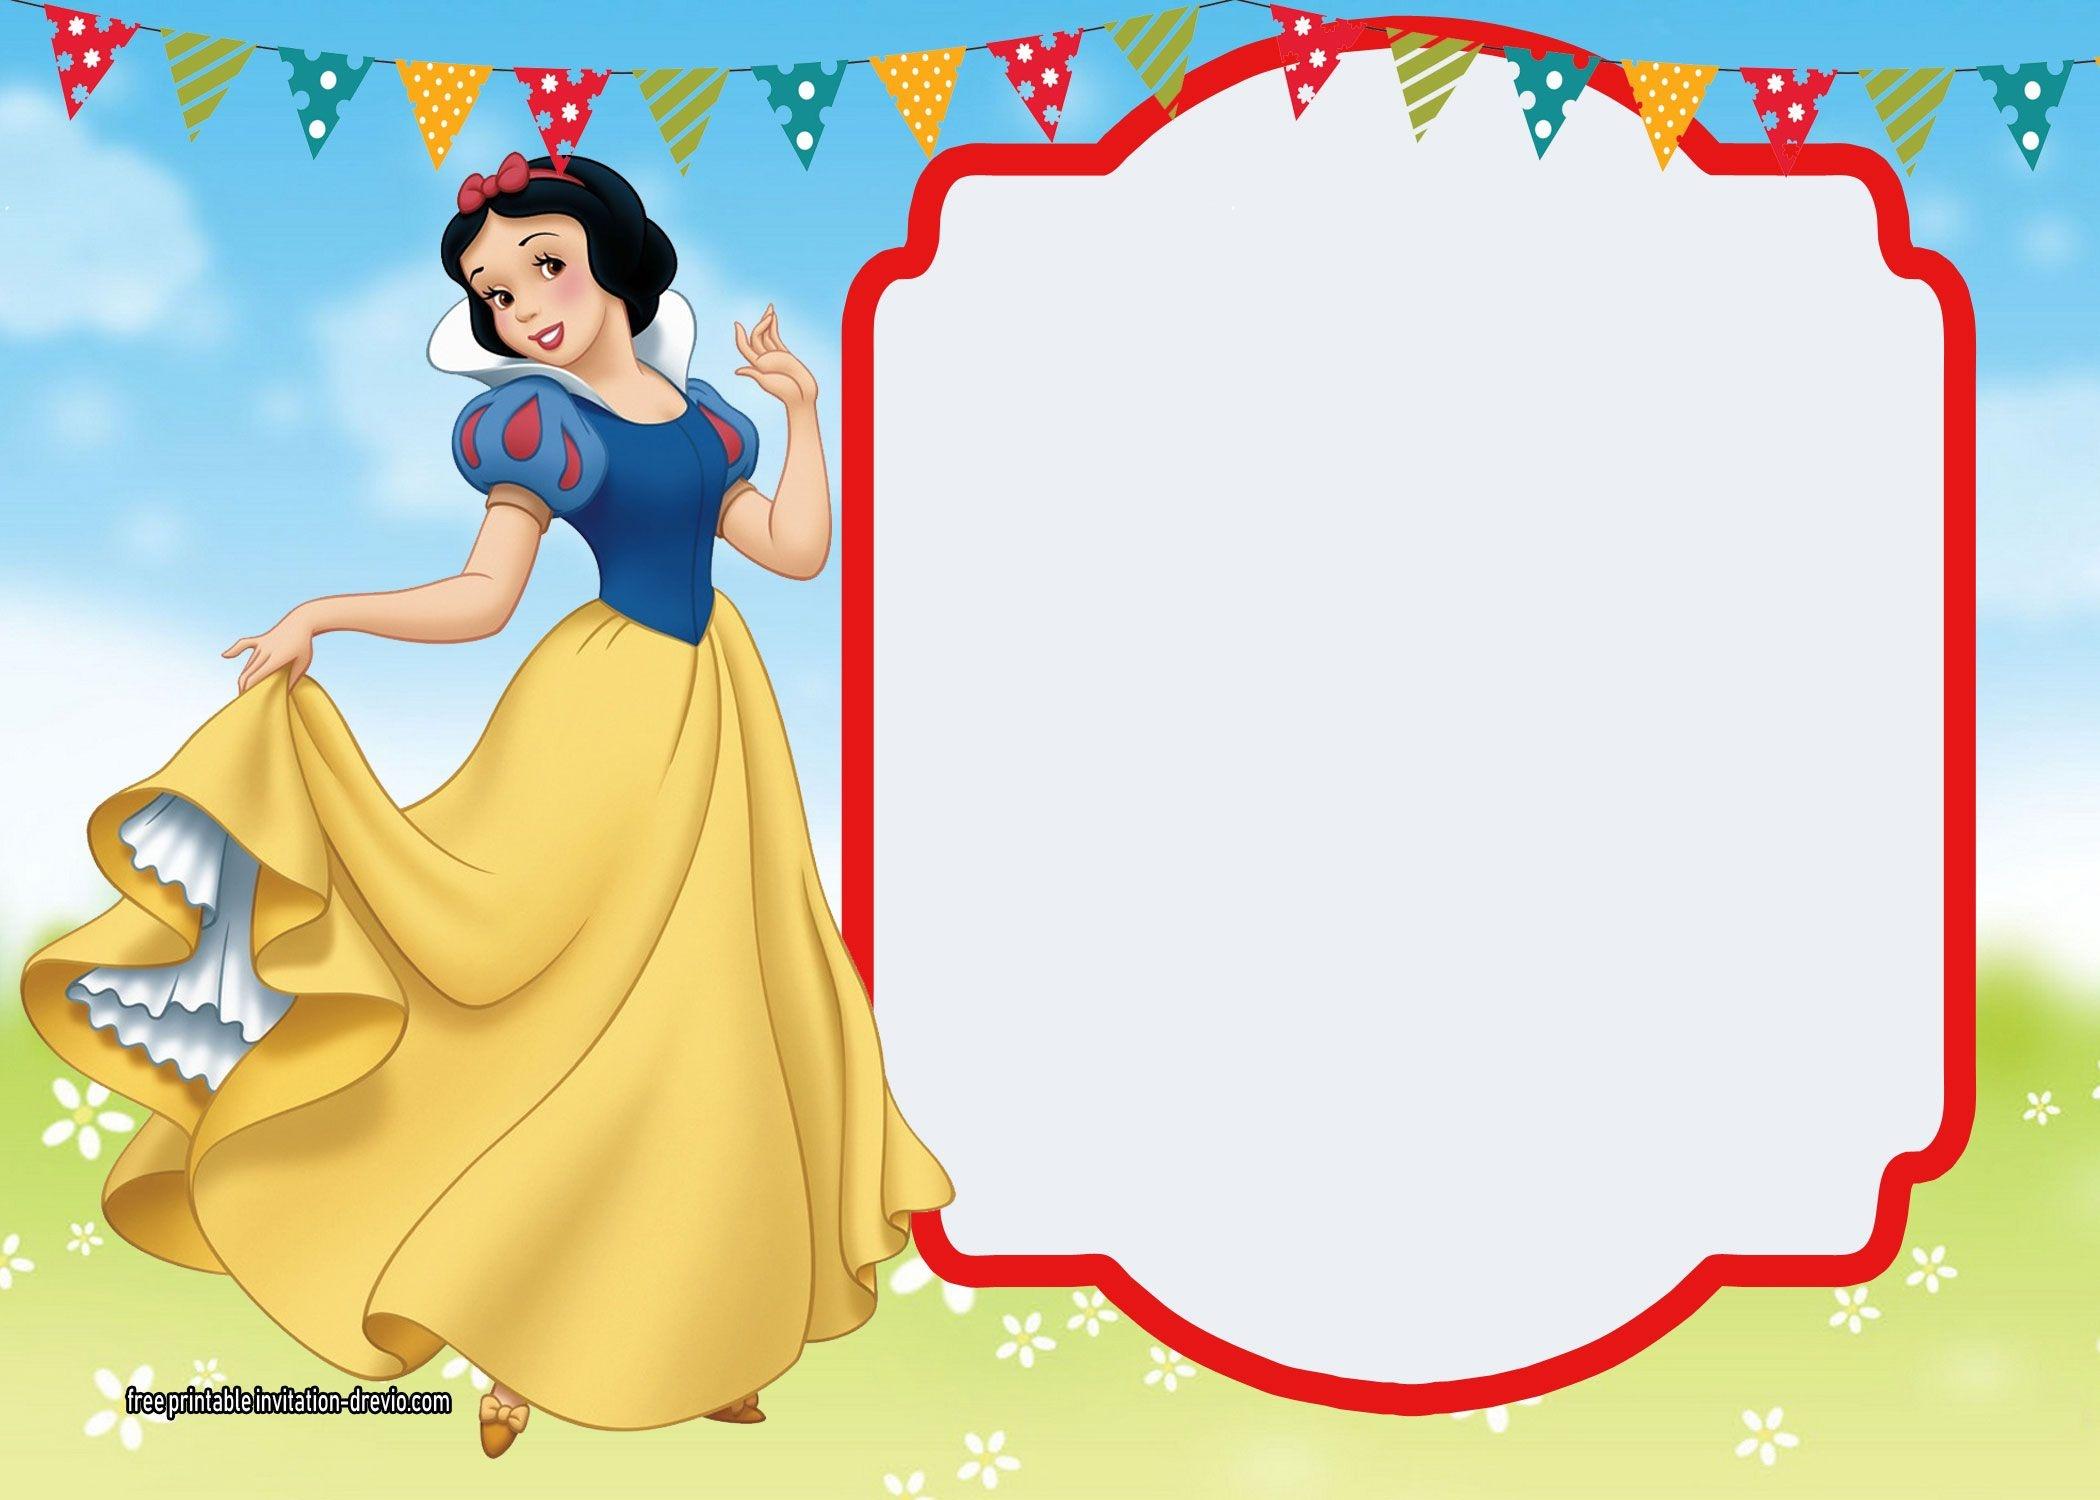 Free Printable Snow White Invitations - Complete Edition | Free - Snow White Invitations Free Printable